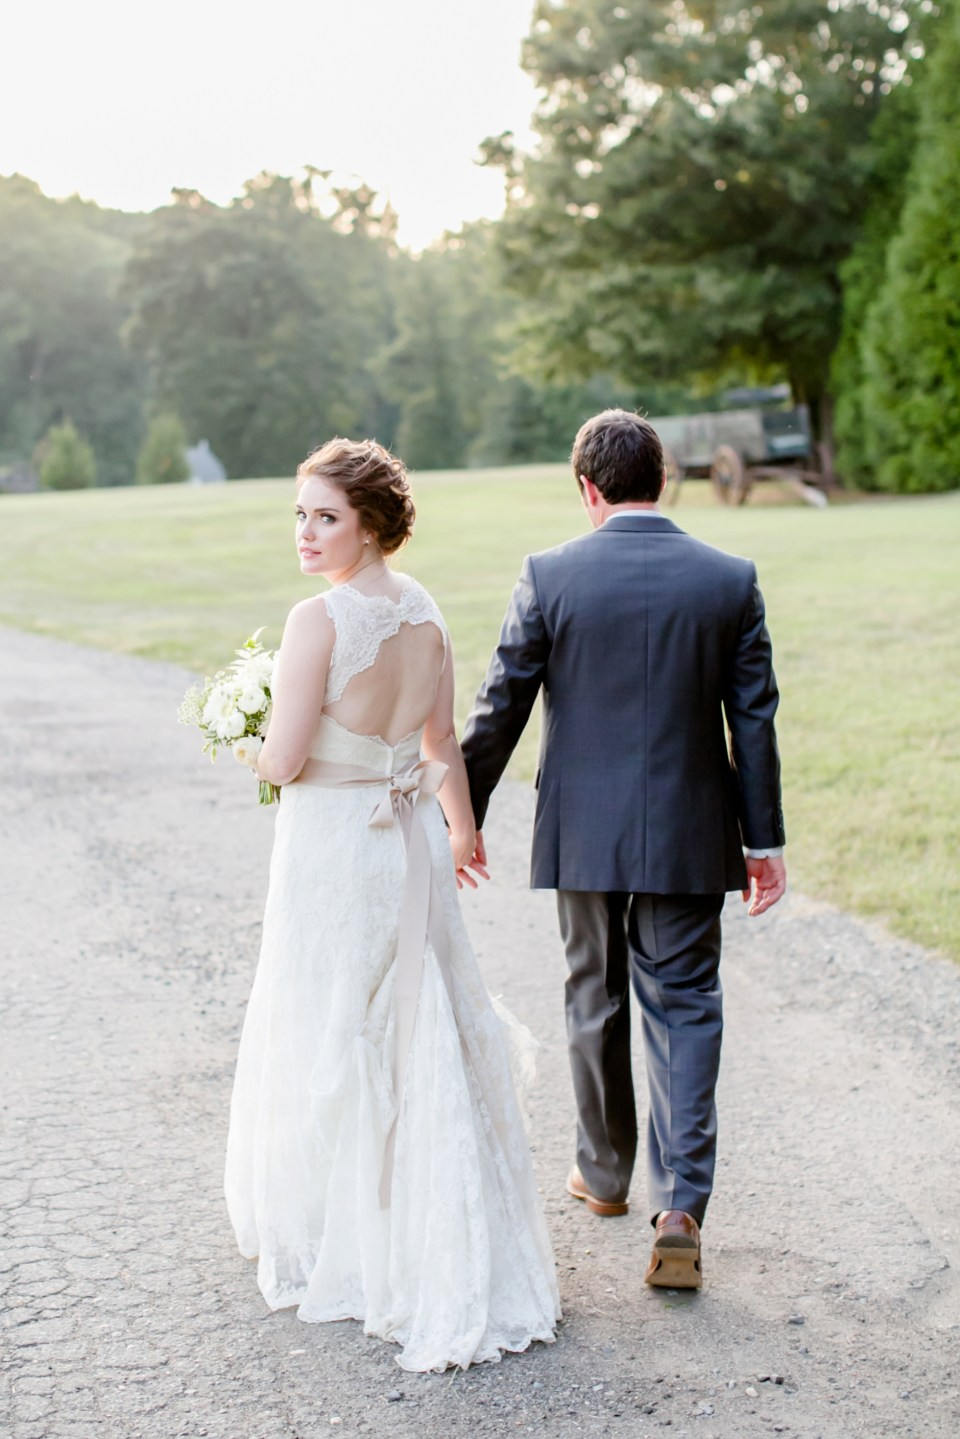 49a-stevenson-ridge-wedding-rustic-kaitlin-parker-1143